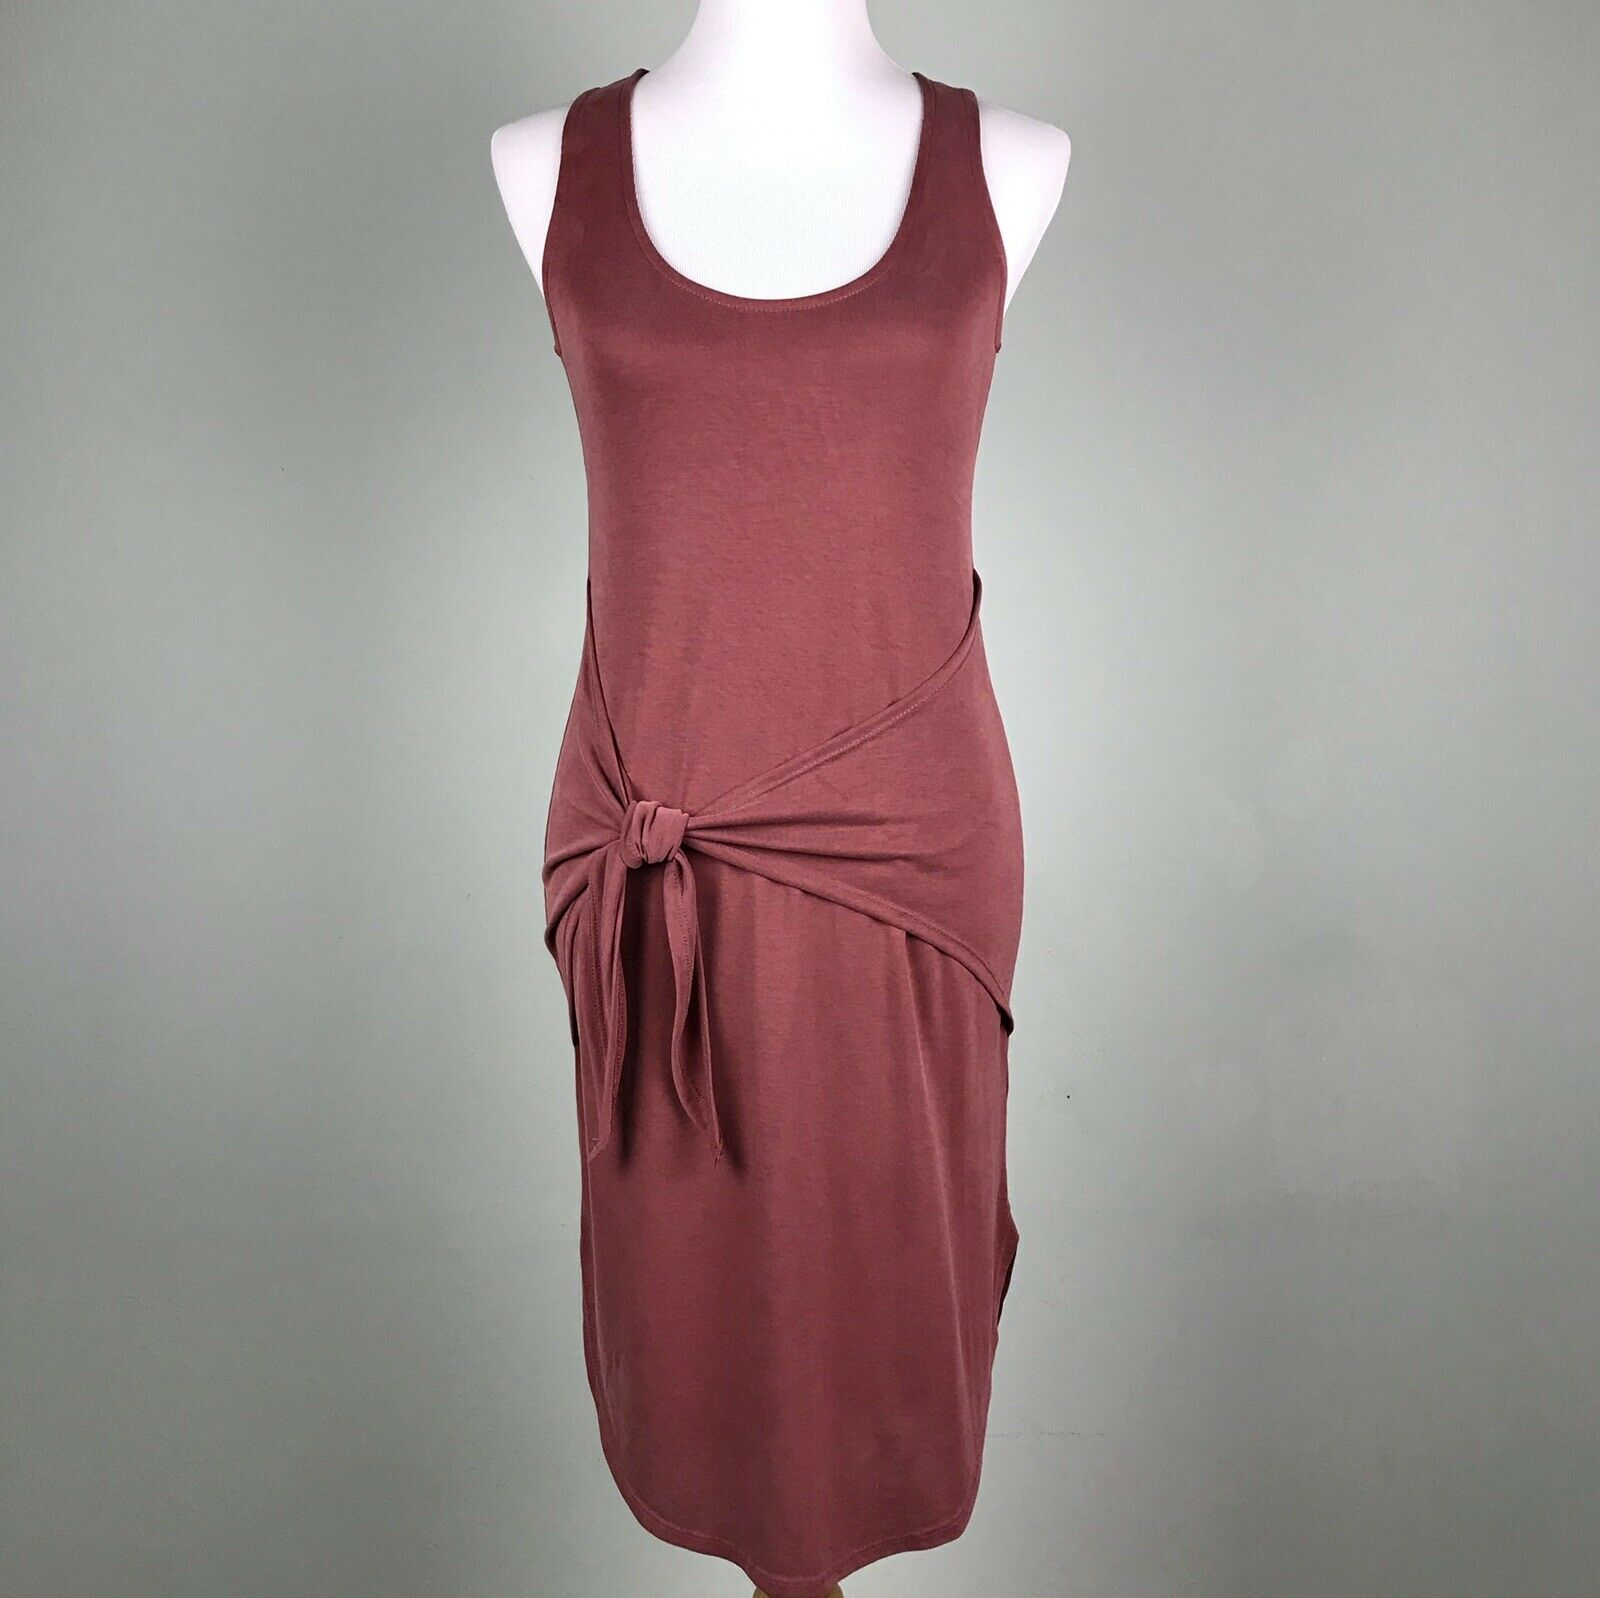 Gianni Bini Red Tank Dress Size XS 0 2 Sleeveless Tie Sash Waist Bodycon